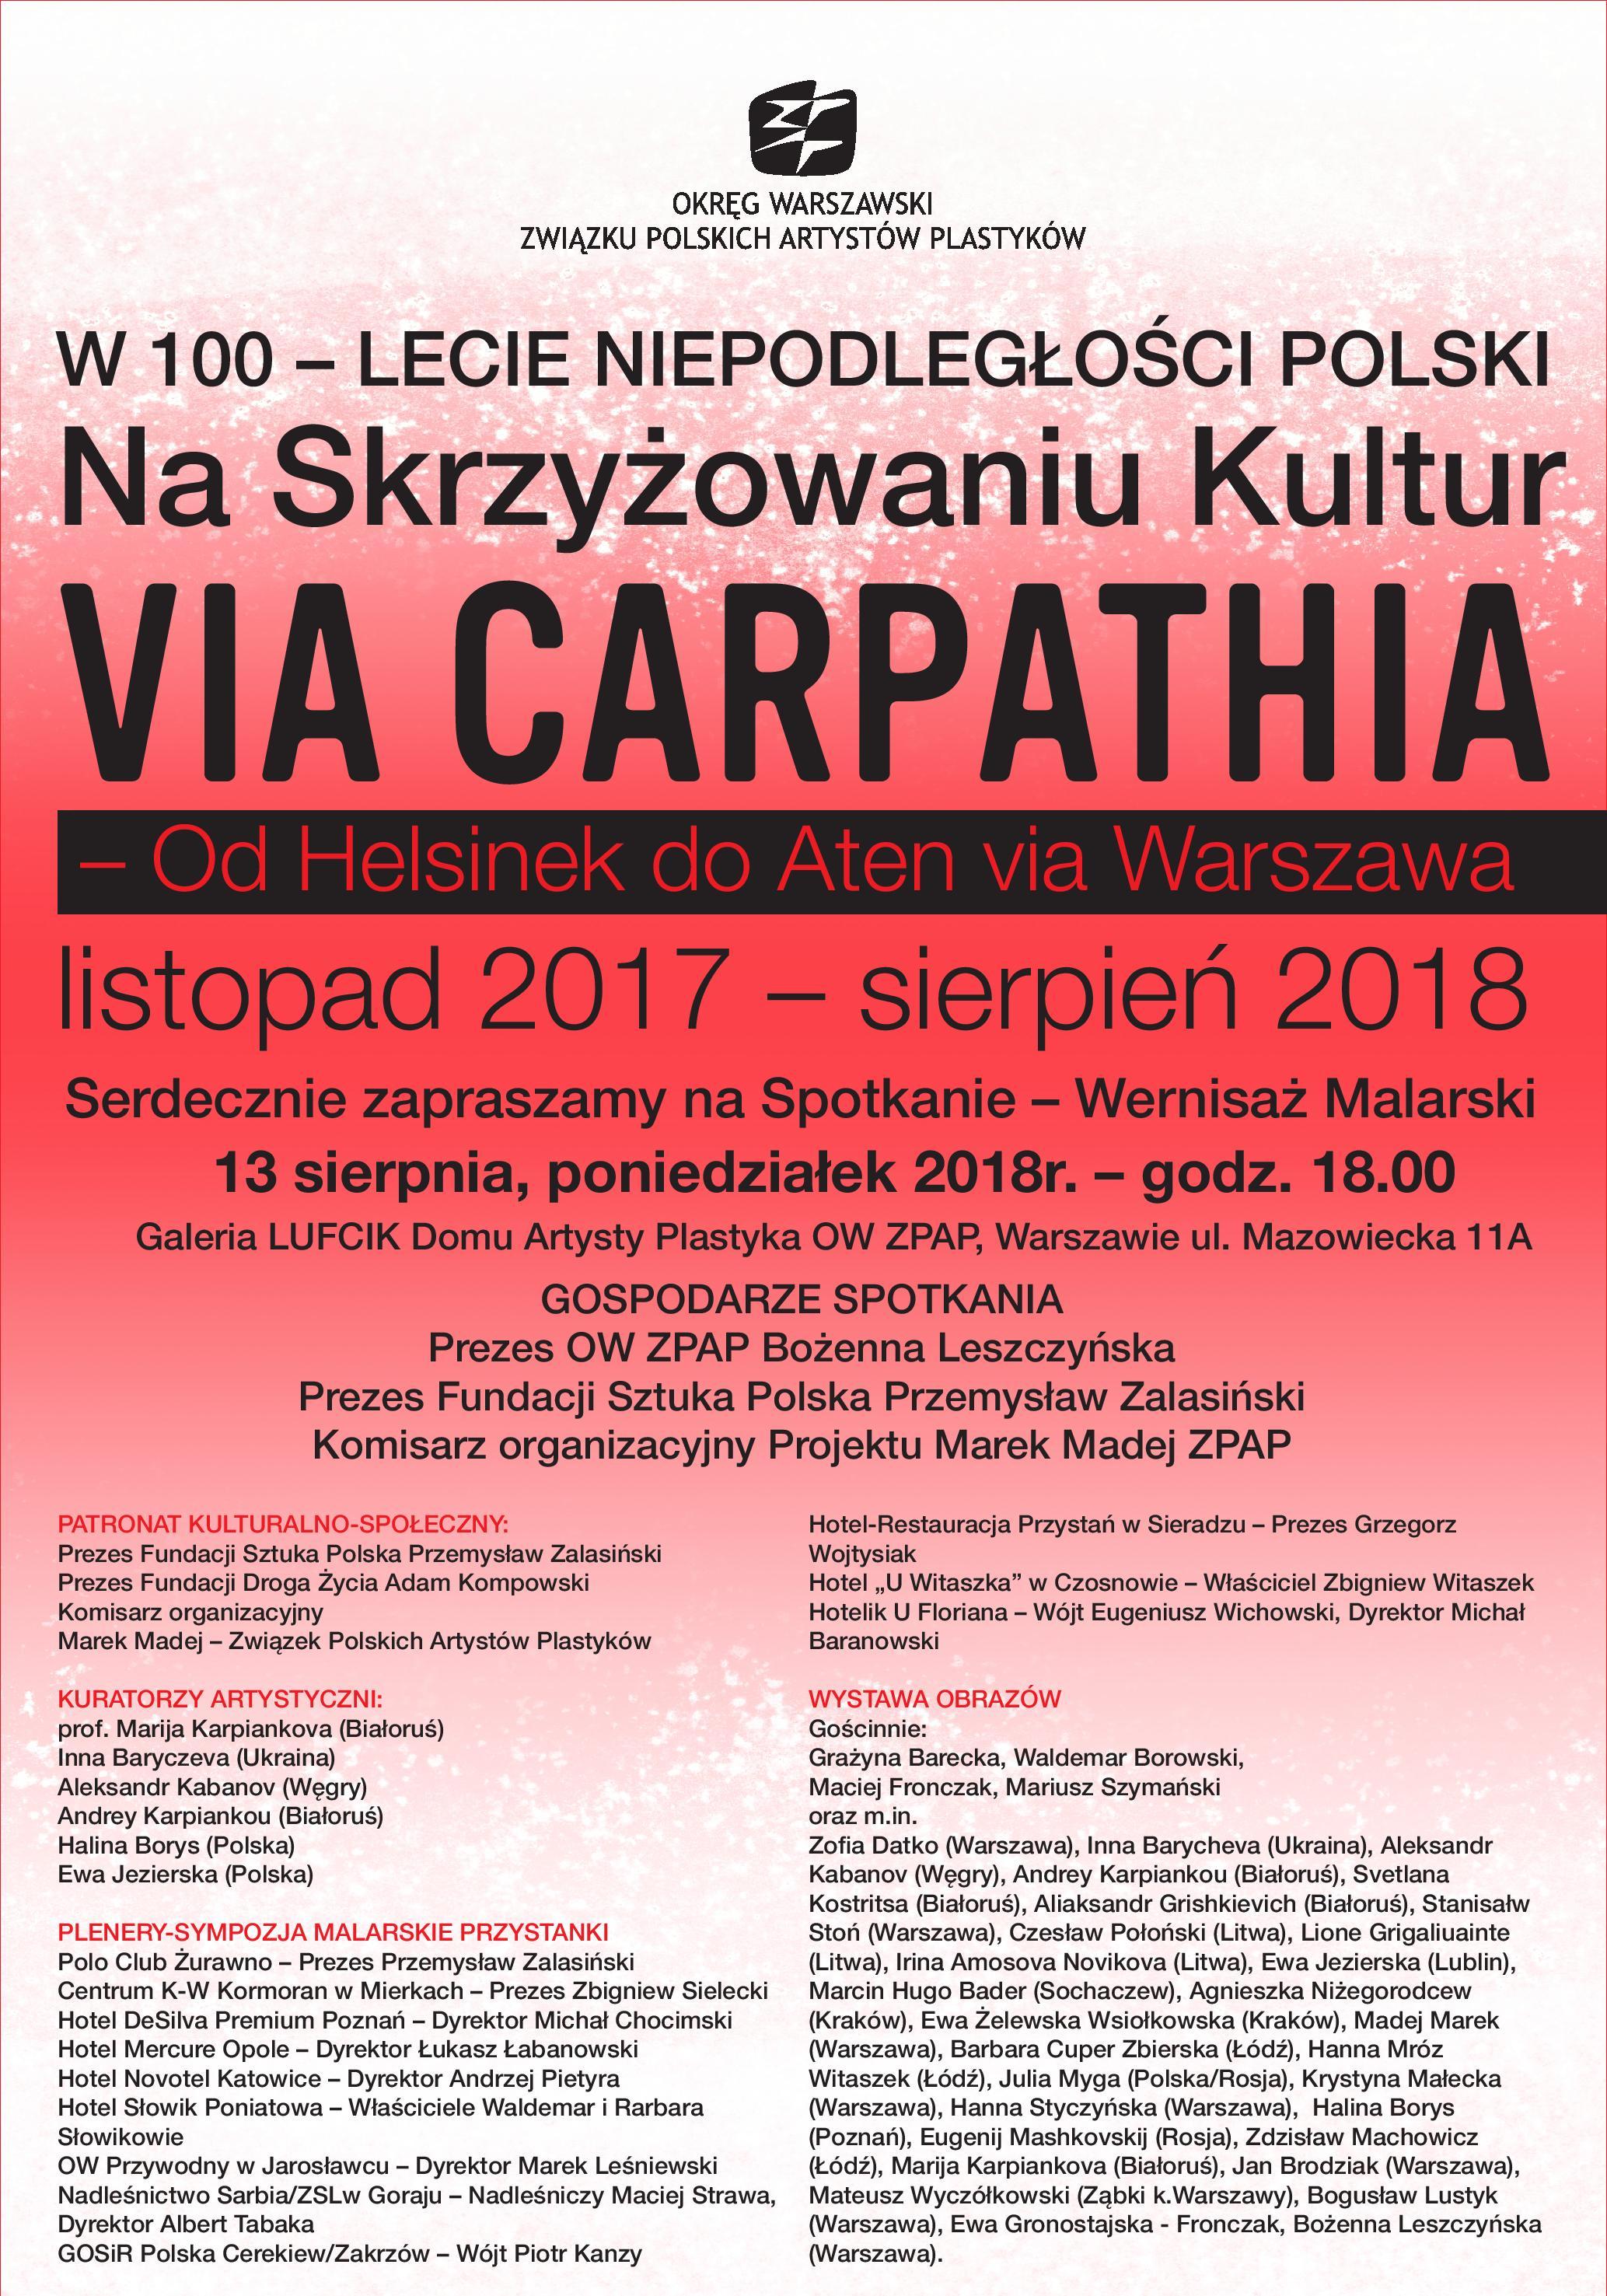 ViaCarpathia 2018